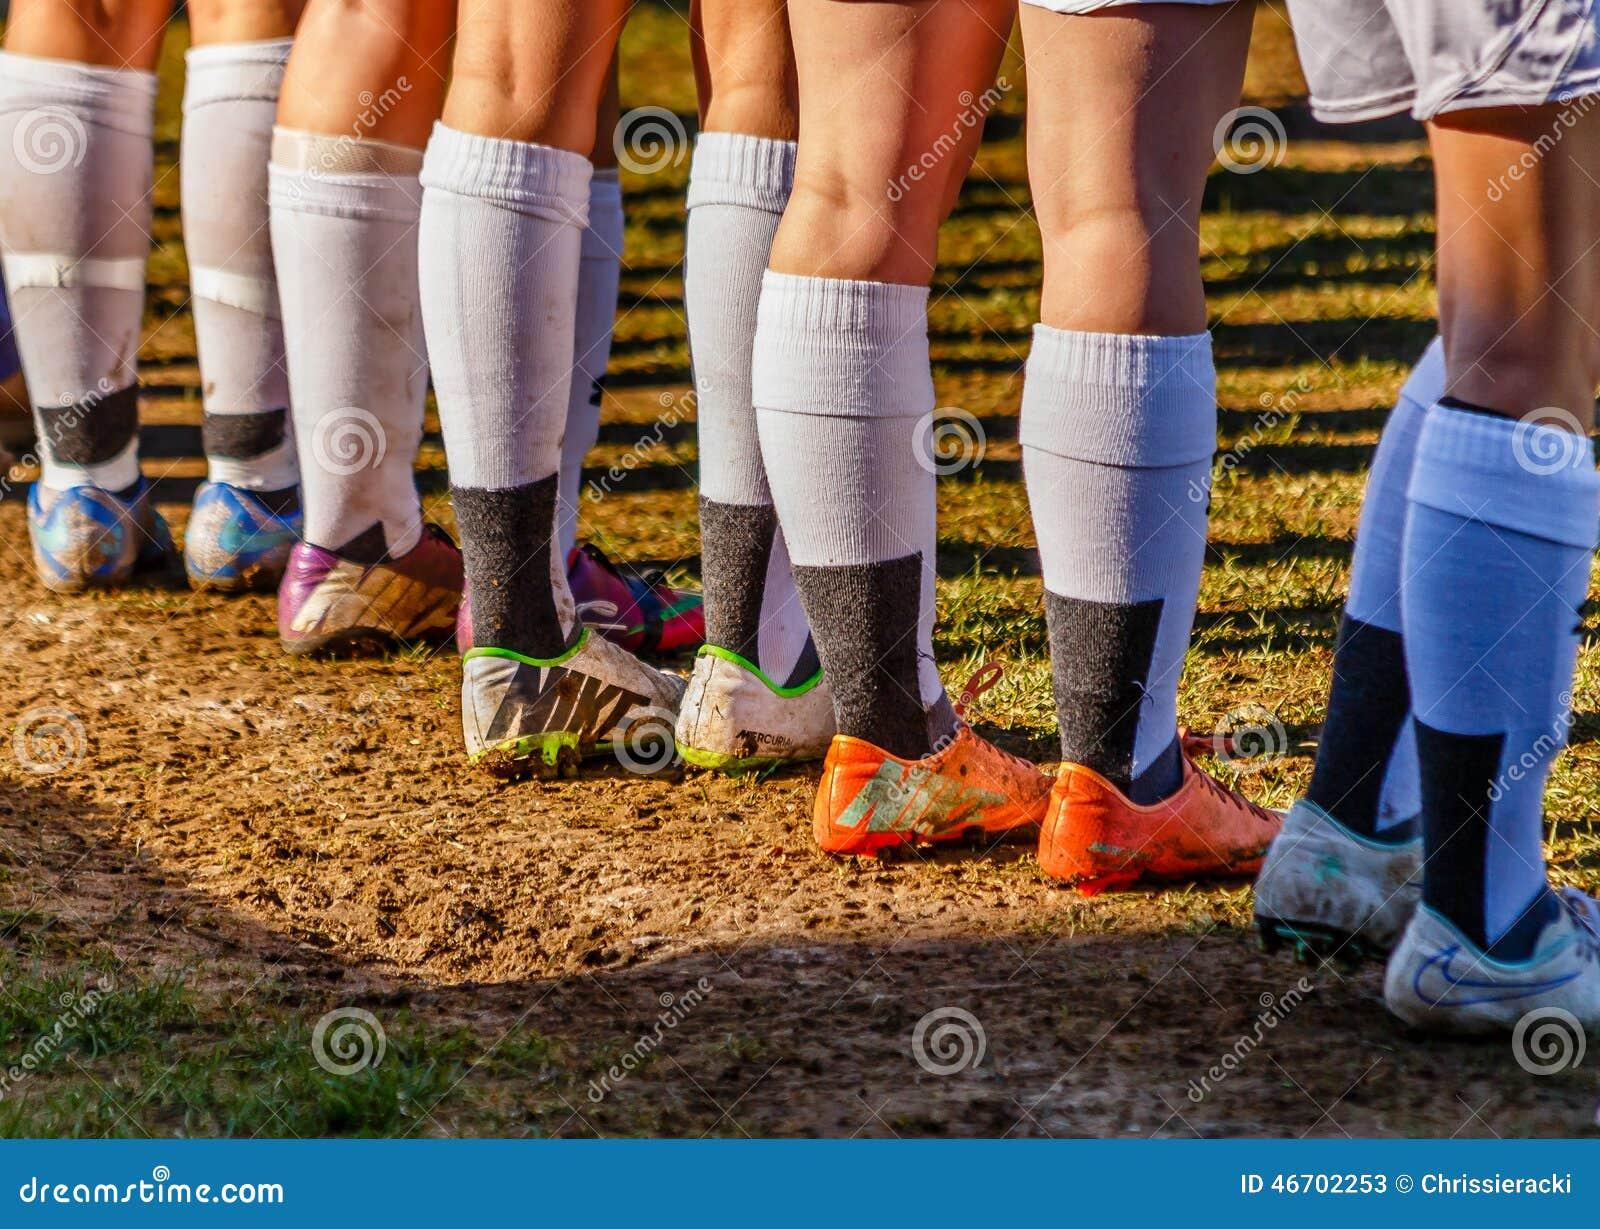 White soccer socks in mud - YouTube